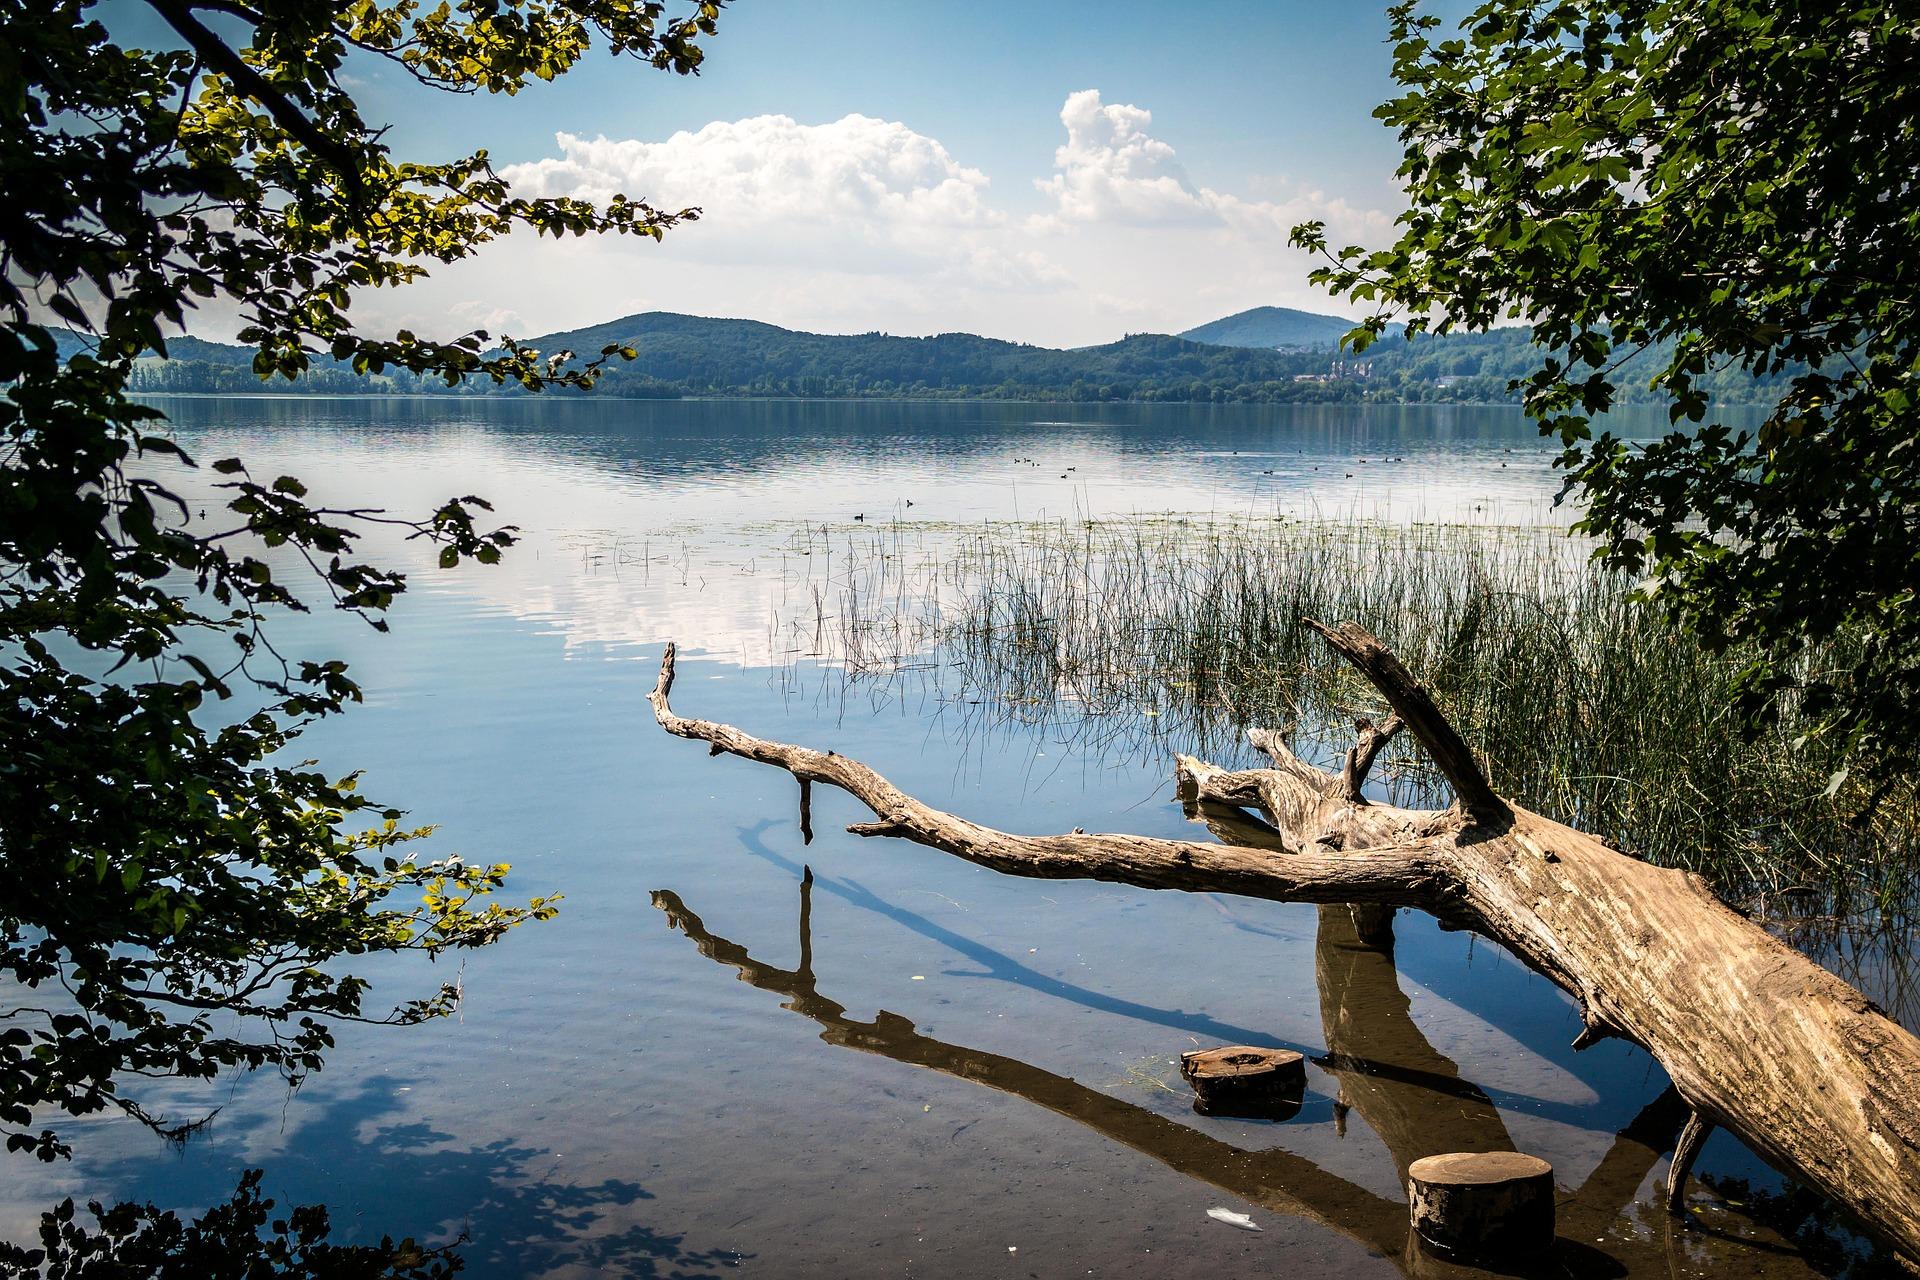 Ausflugsziele Maria Laach, Abtei Maria Laach und Laacher See